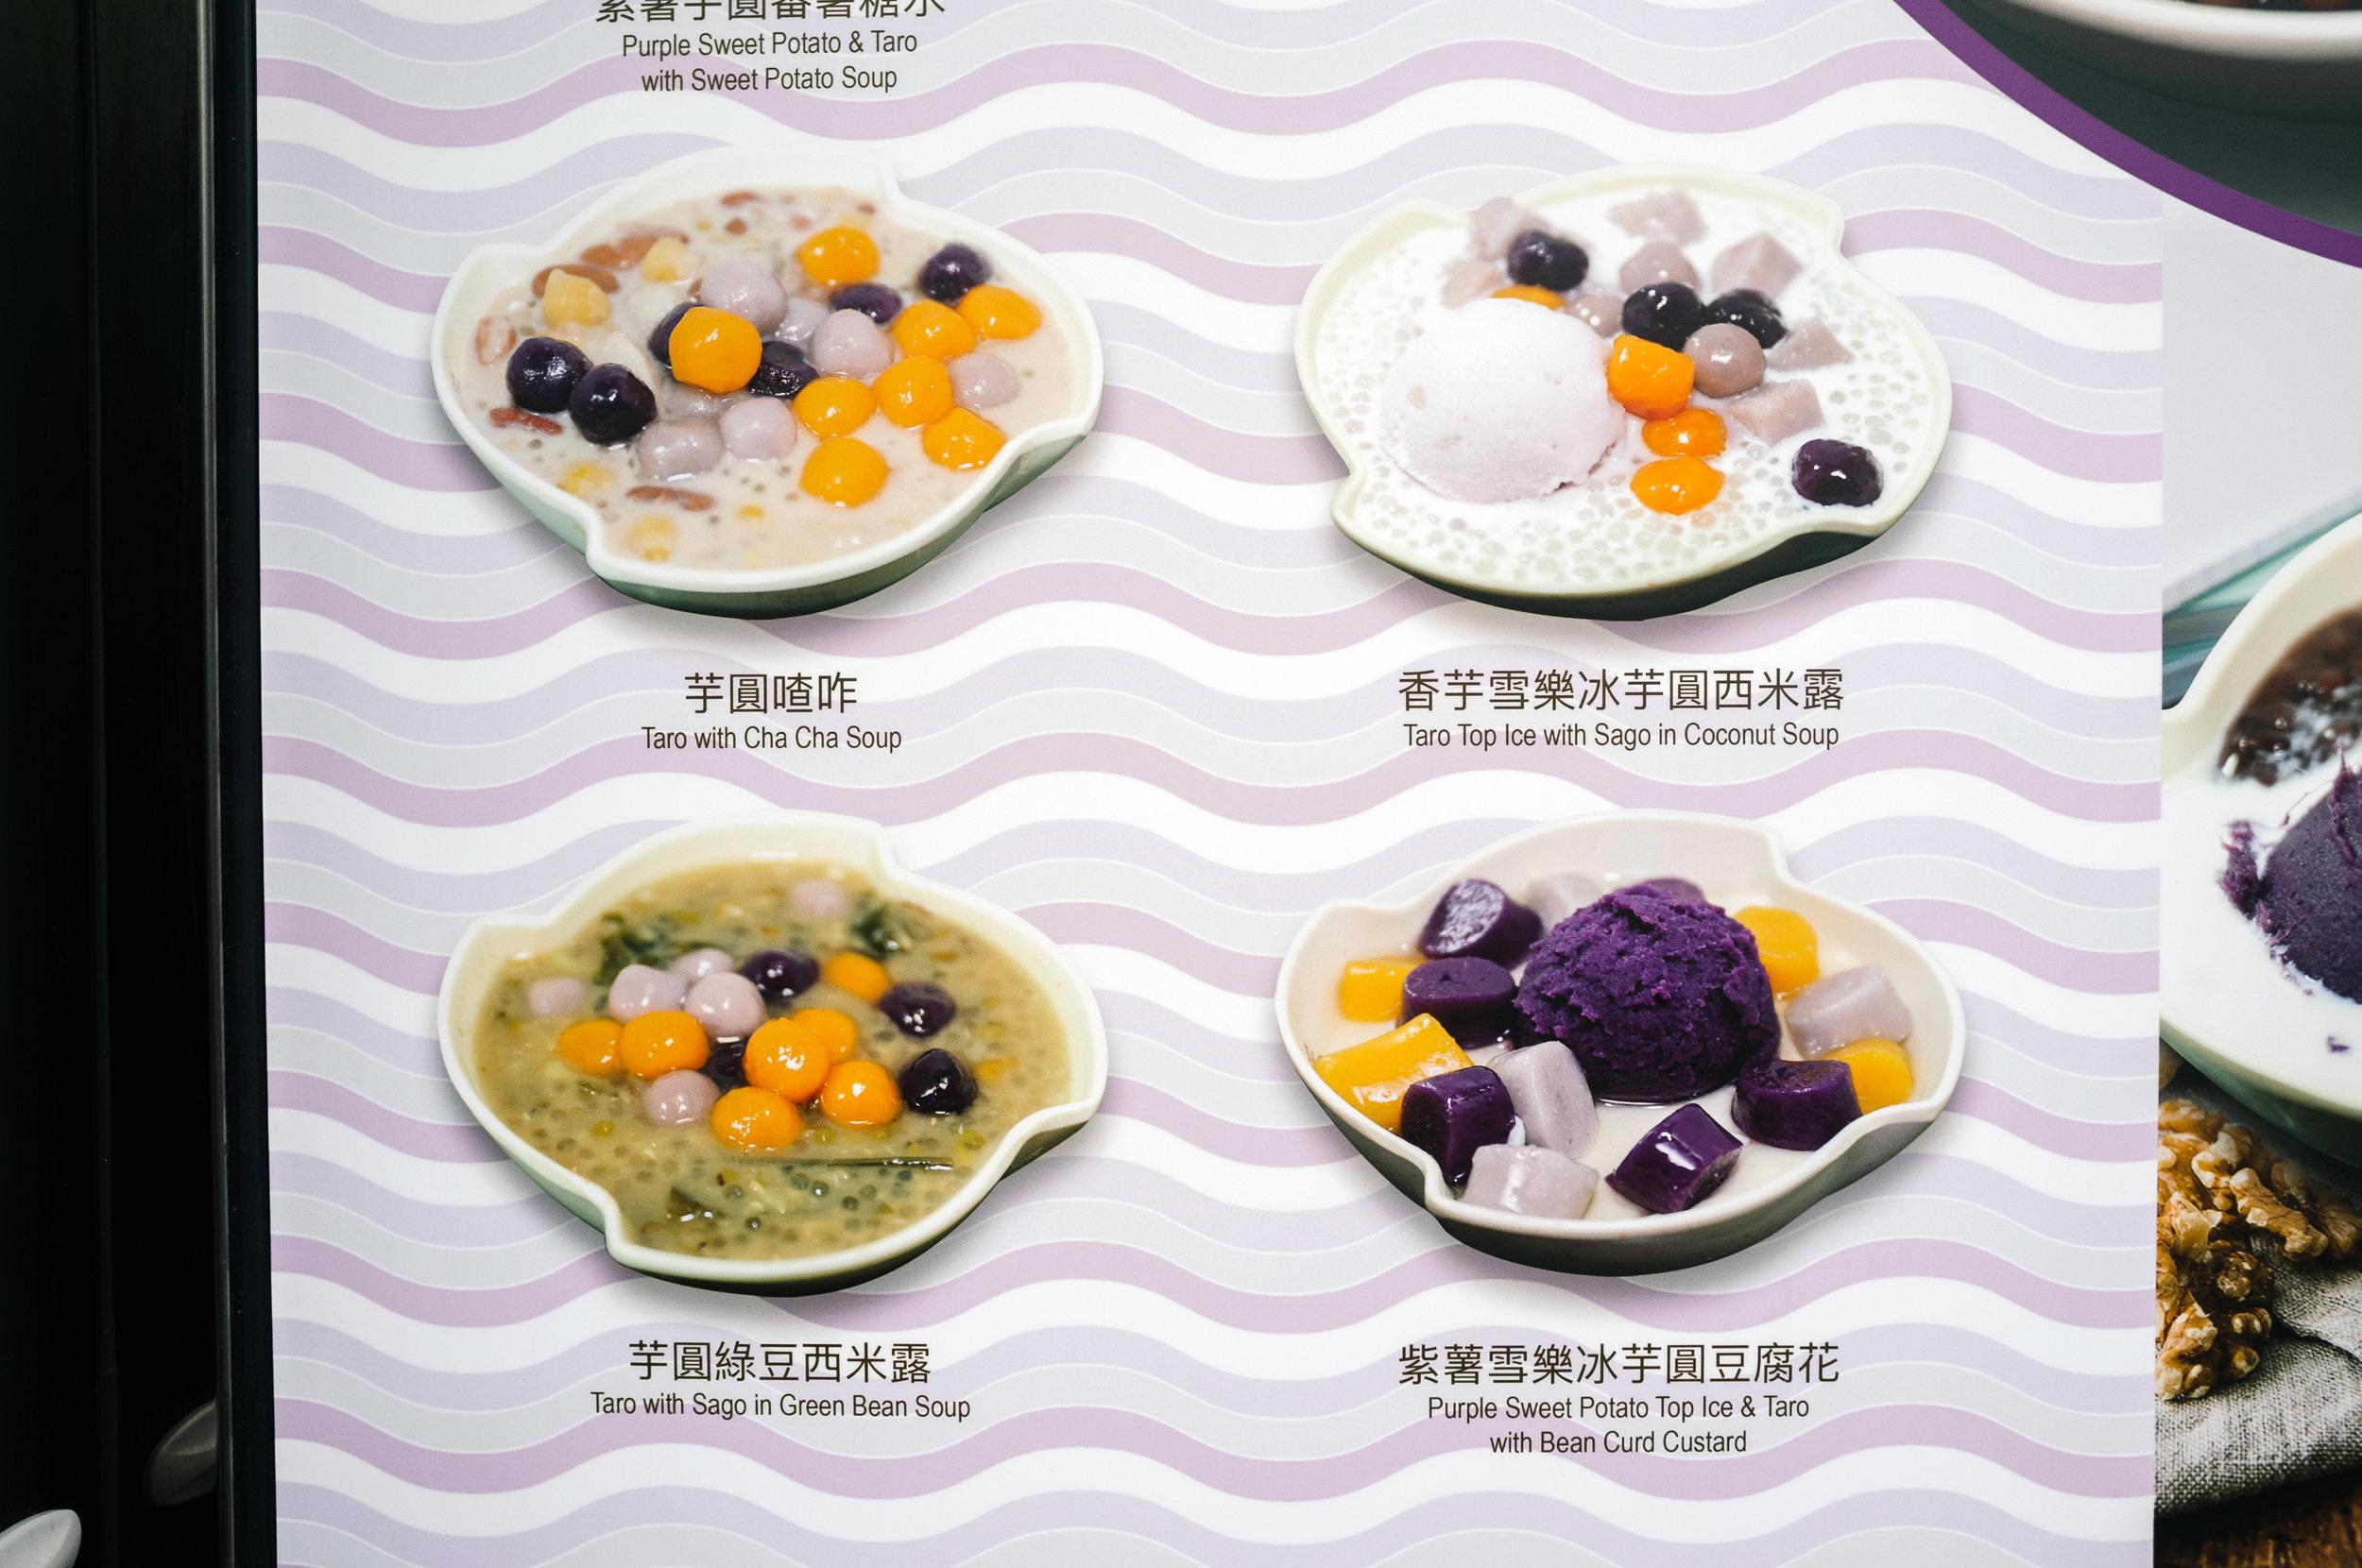 Mong Kok Dessert.jpg